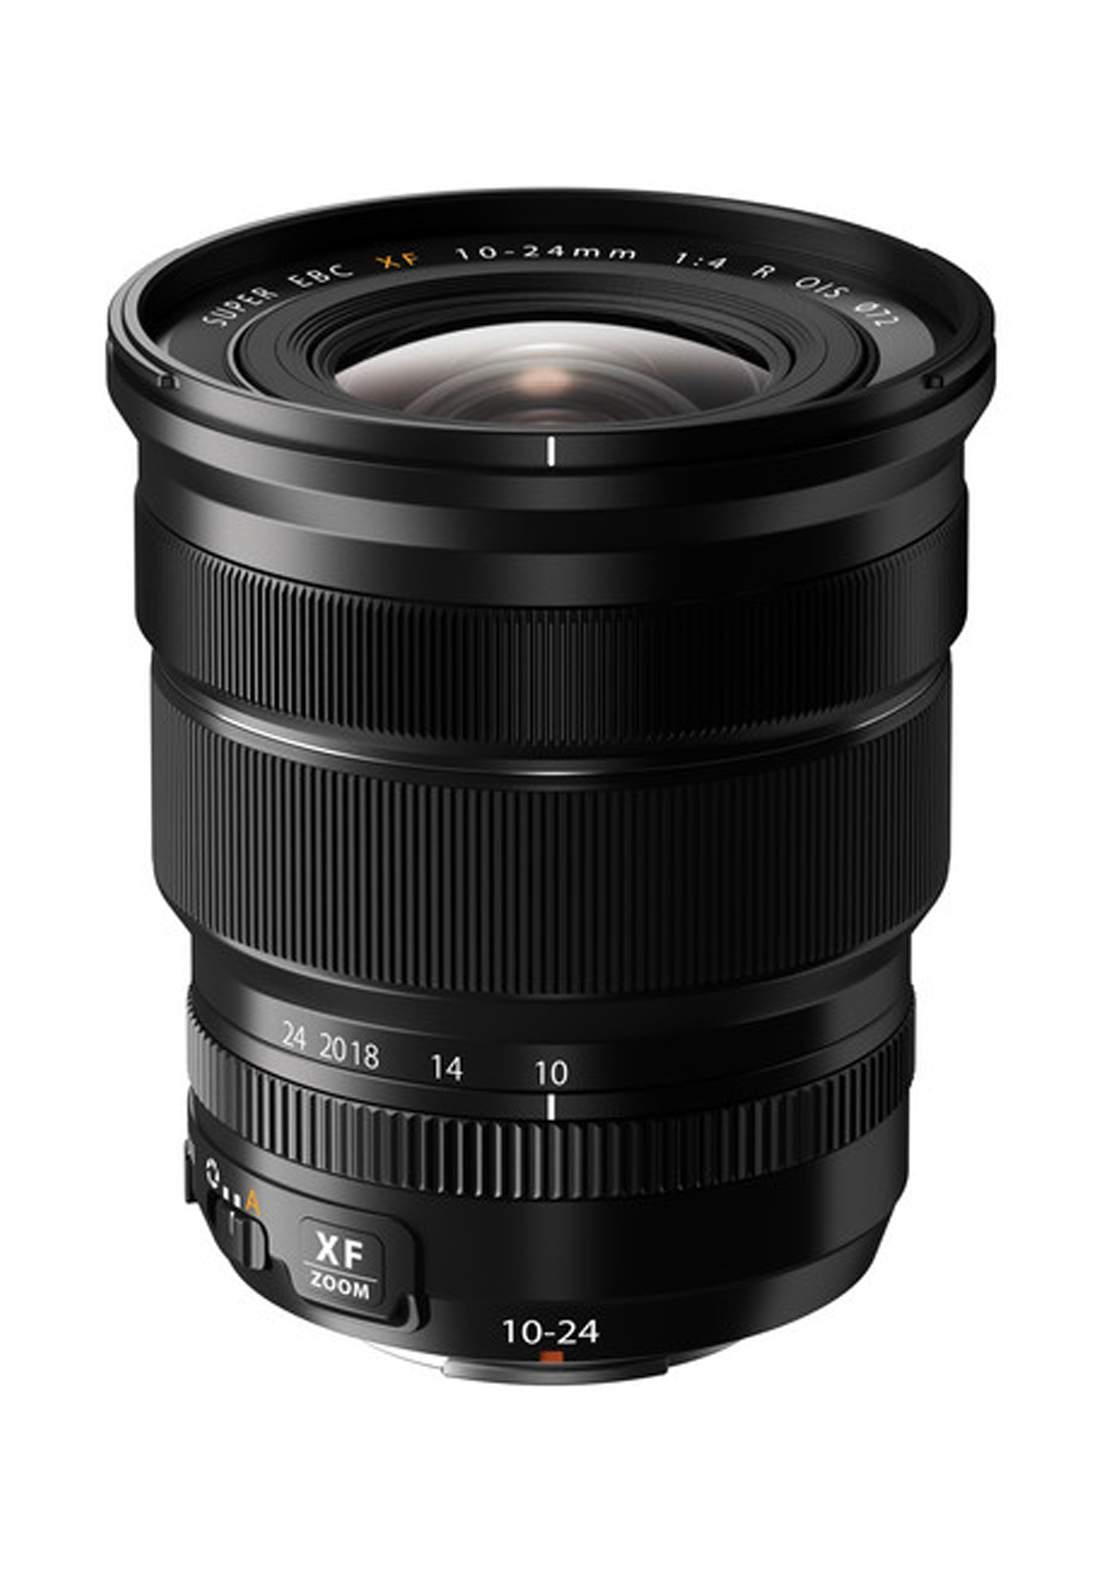 Fujifilm XF 10-24mm F4 R OIS Lens  - Black عدسة كاميرا